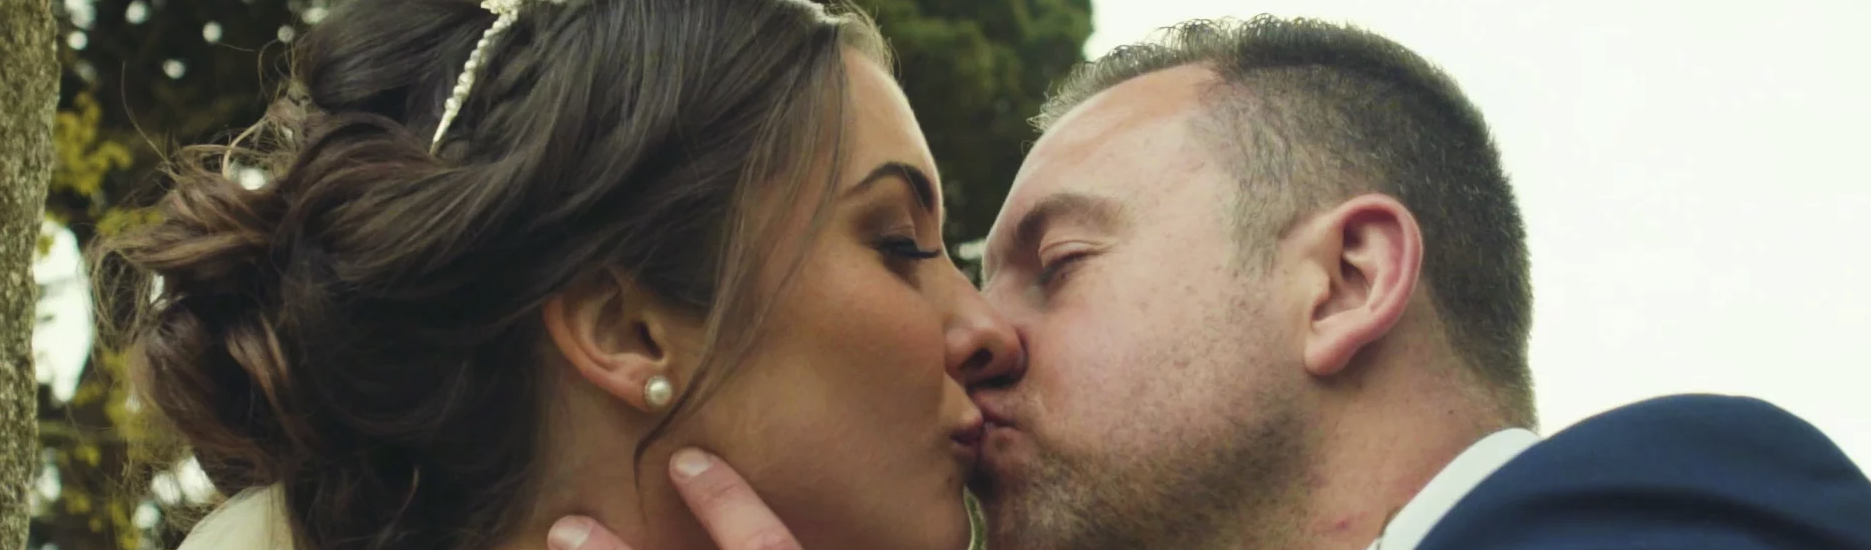 falmouth wedding video